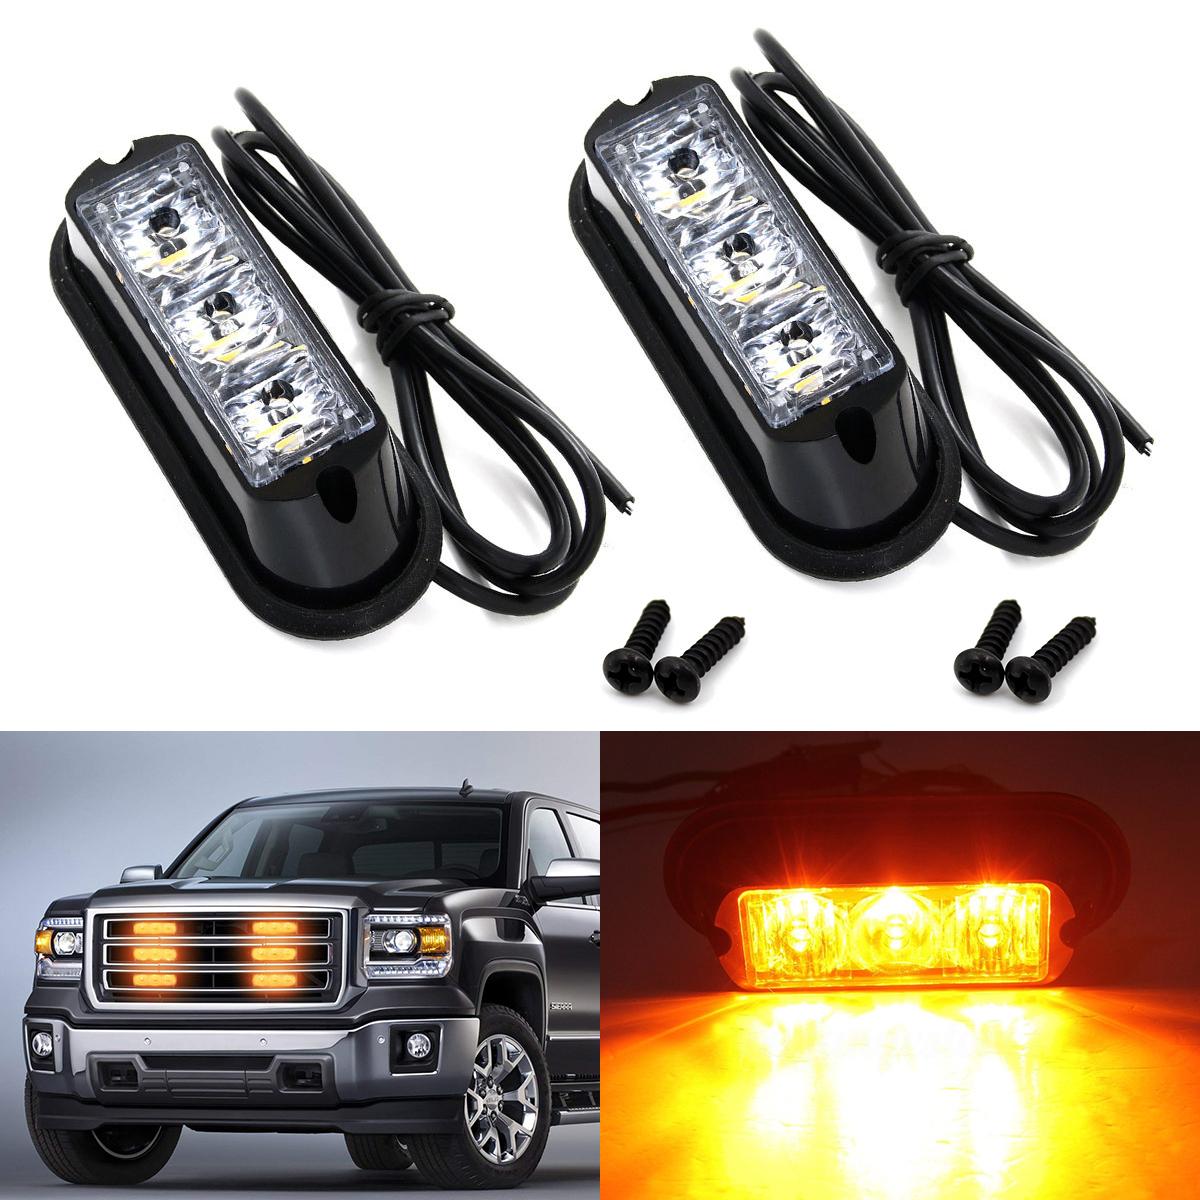 2x 10 LED Flashing Grille Deck Headlight Strobe Warning Flashing Light Amber